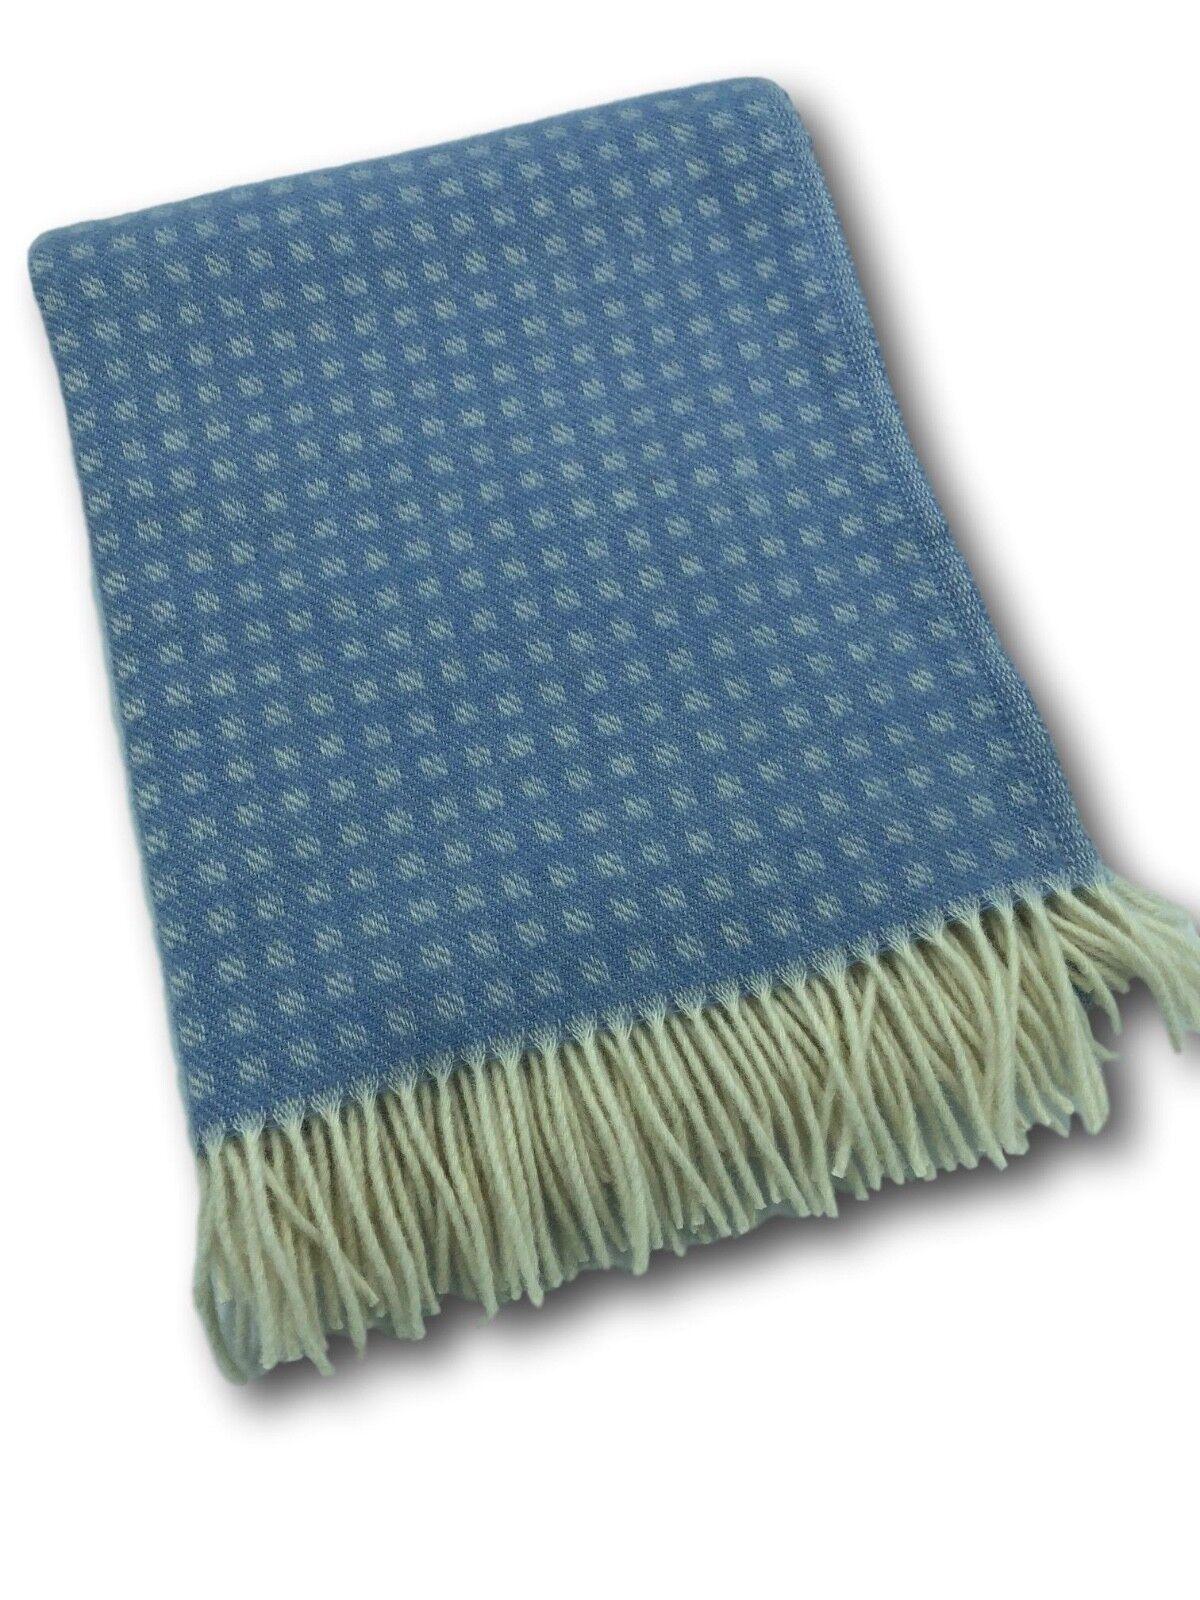 Wool Blanket Bedspread Coupling Sofa Cover 100% bluee Cream 55 1 8x78 11 16in